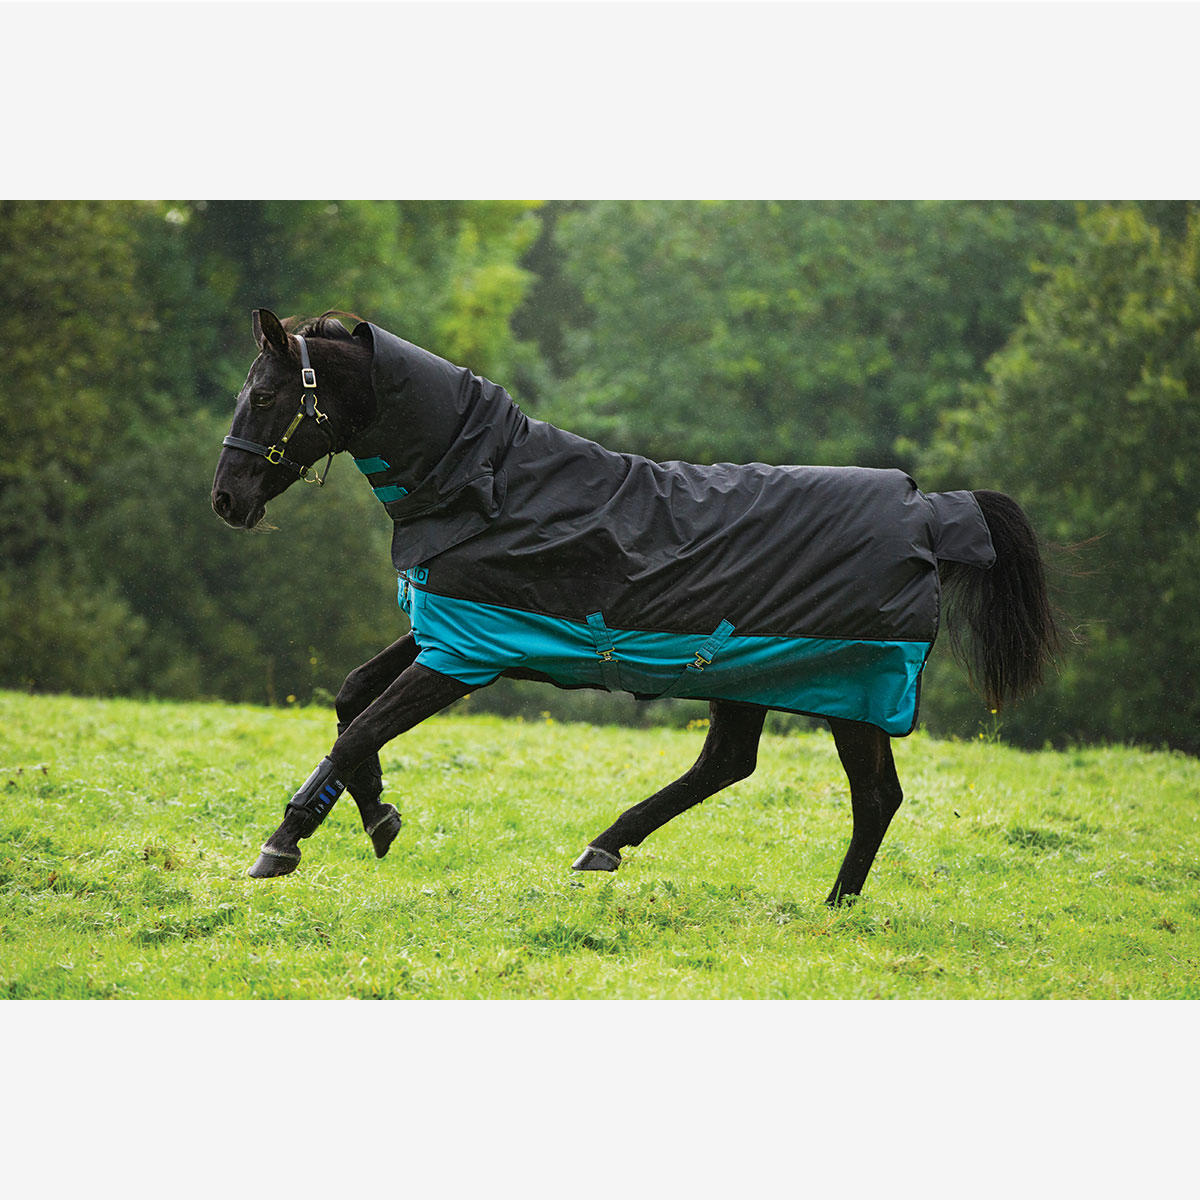 horseware mio 1 st ck 200g selbst gebunden horze. Black Bedroom Furniture Sets. Home Design Ideas